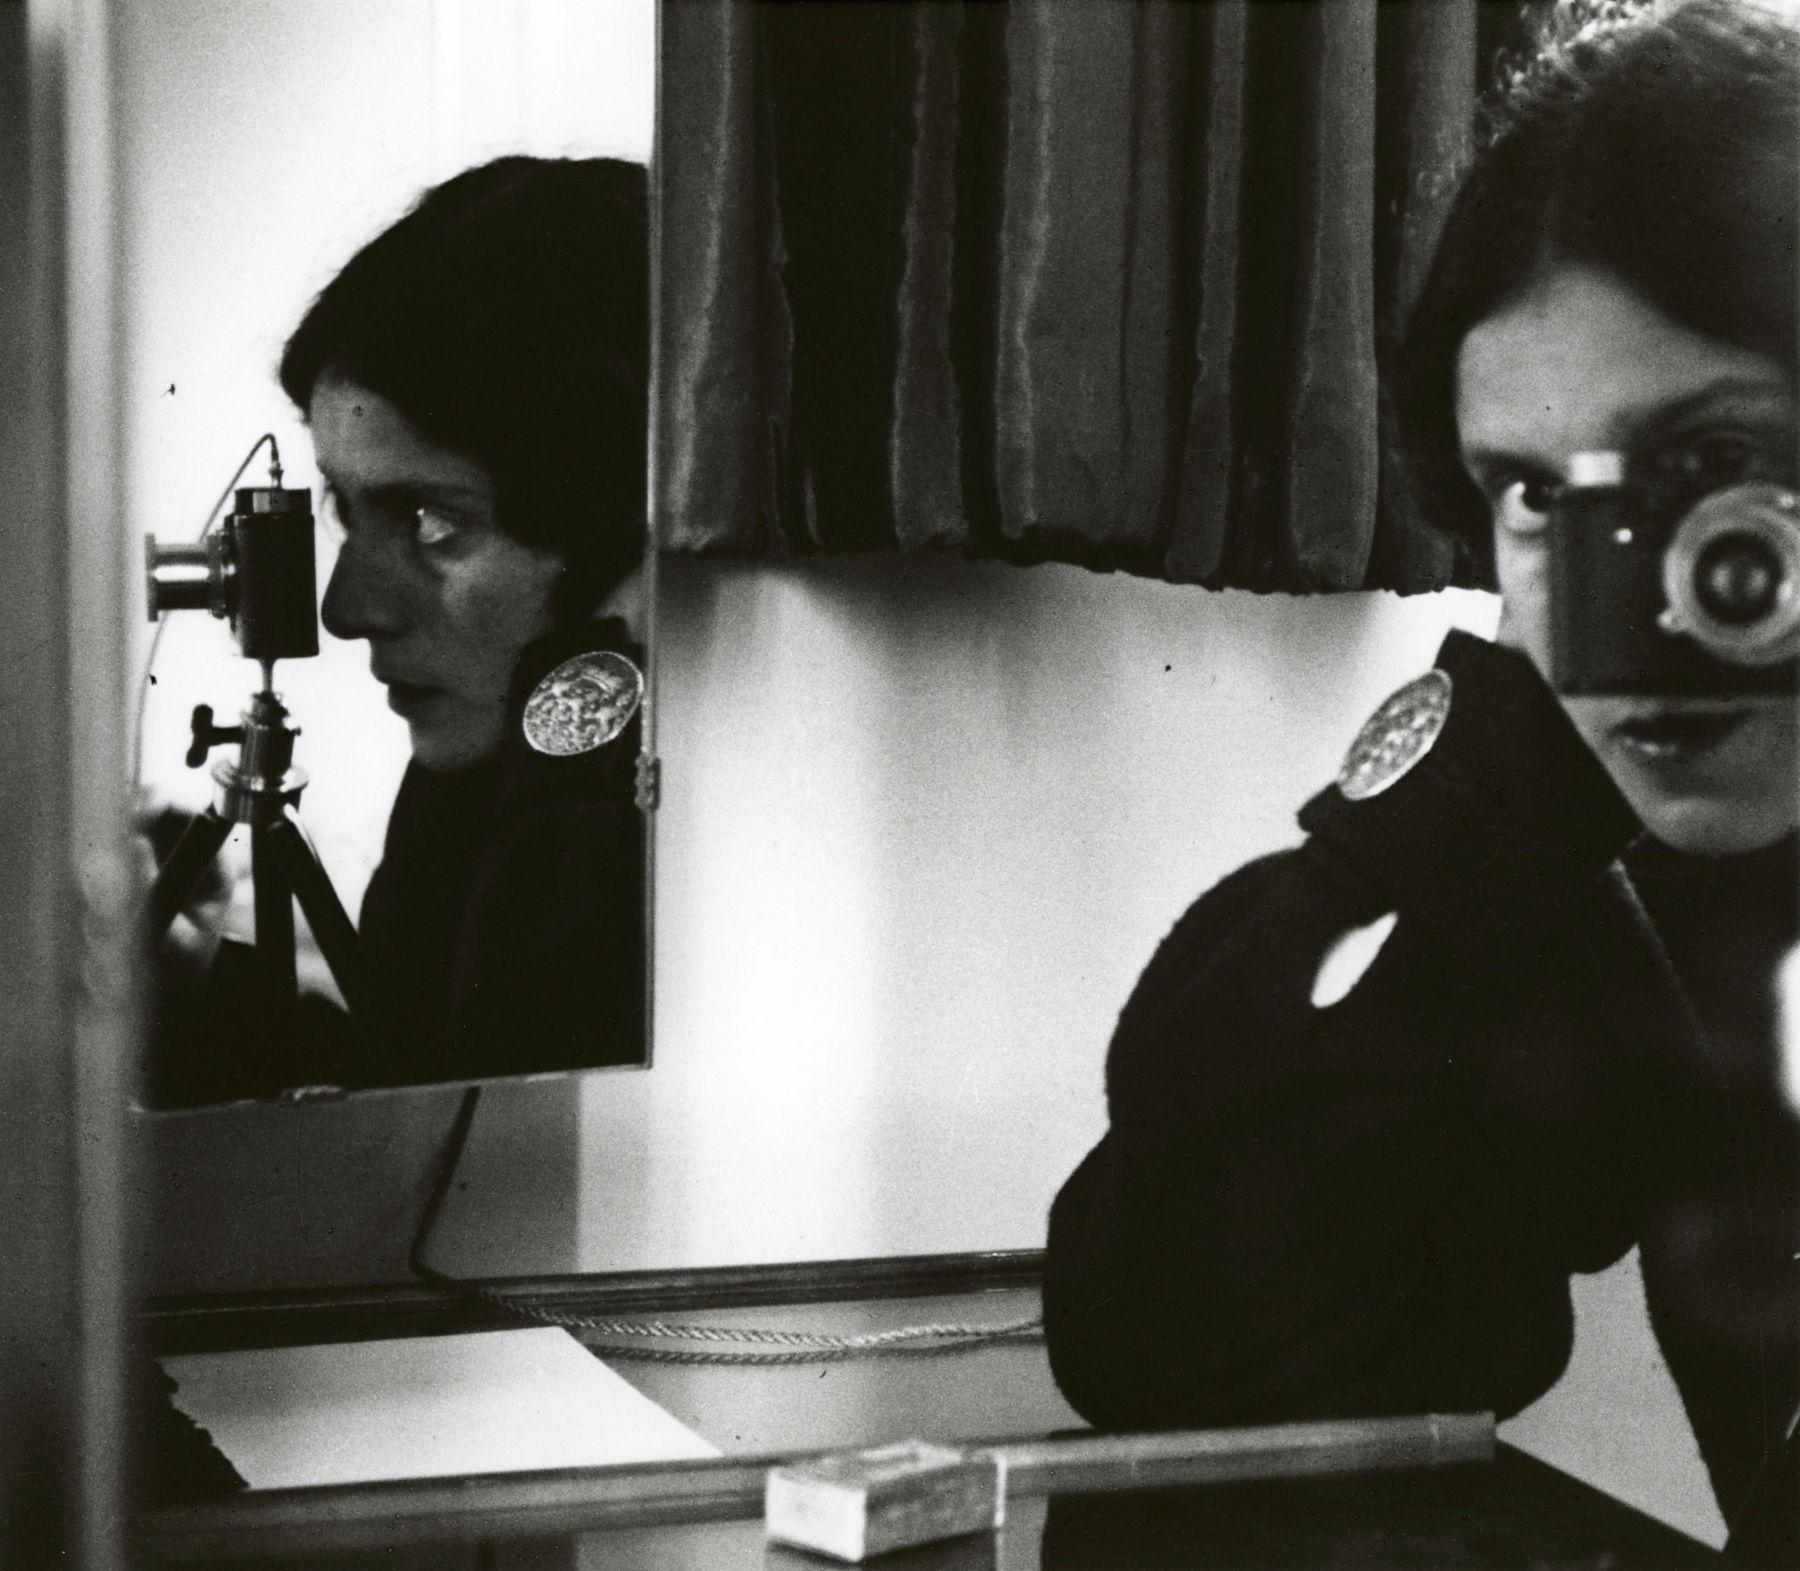 Ilse Bing Self-Portrait with Leica Paris